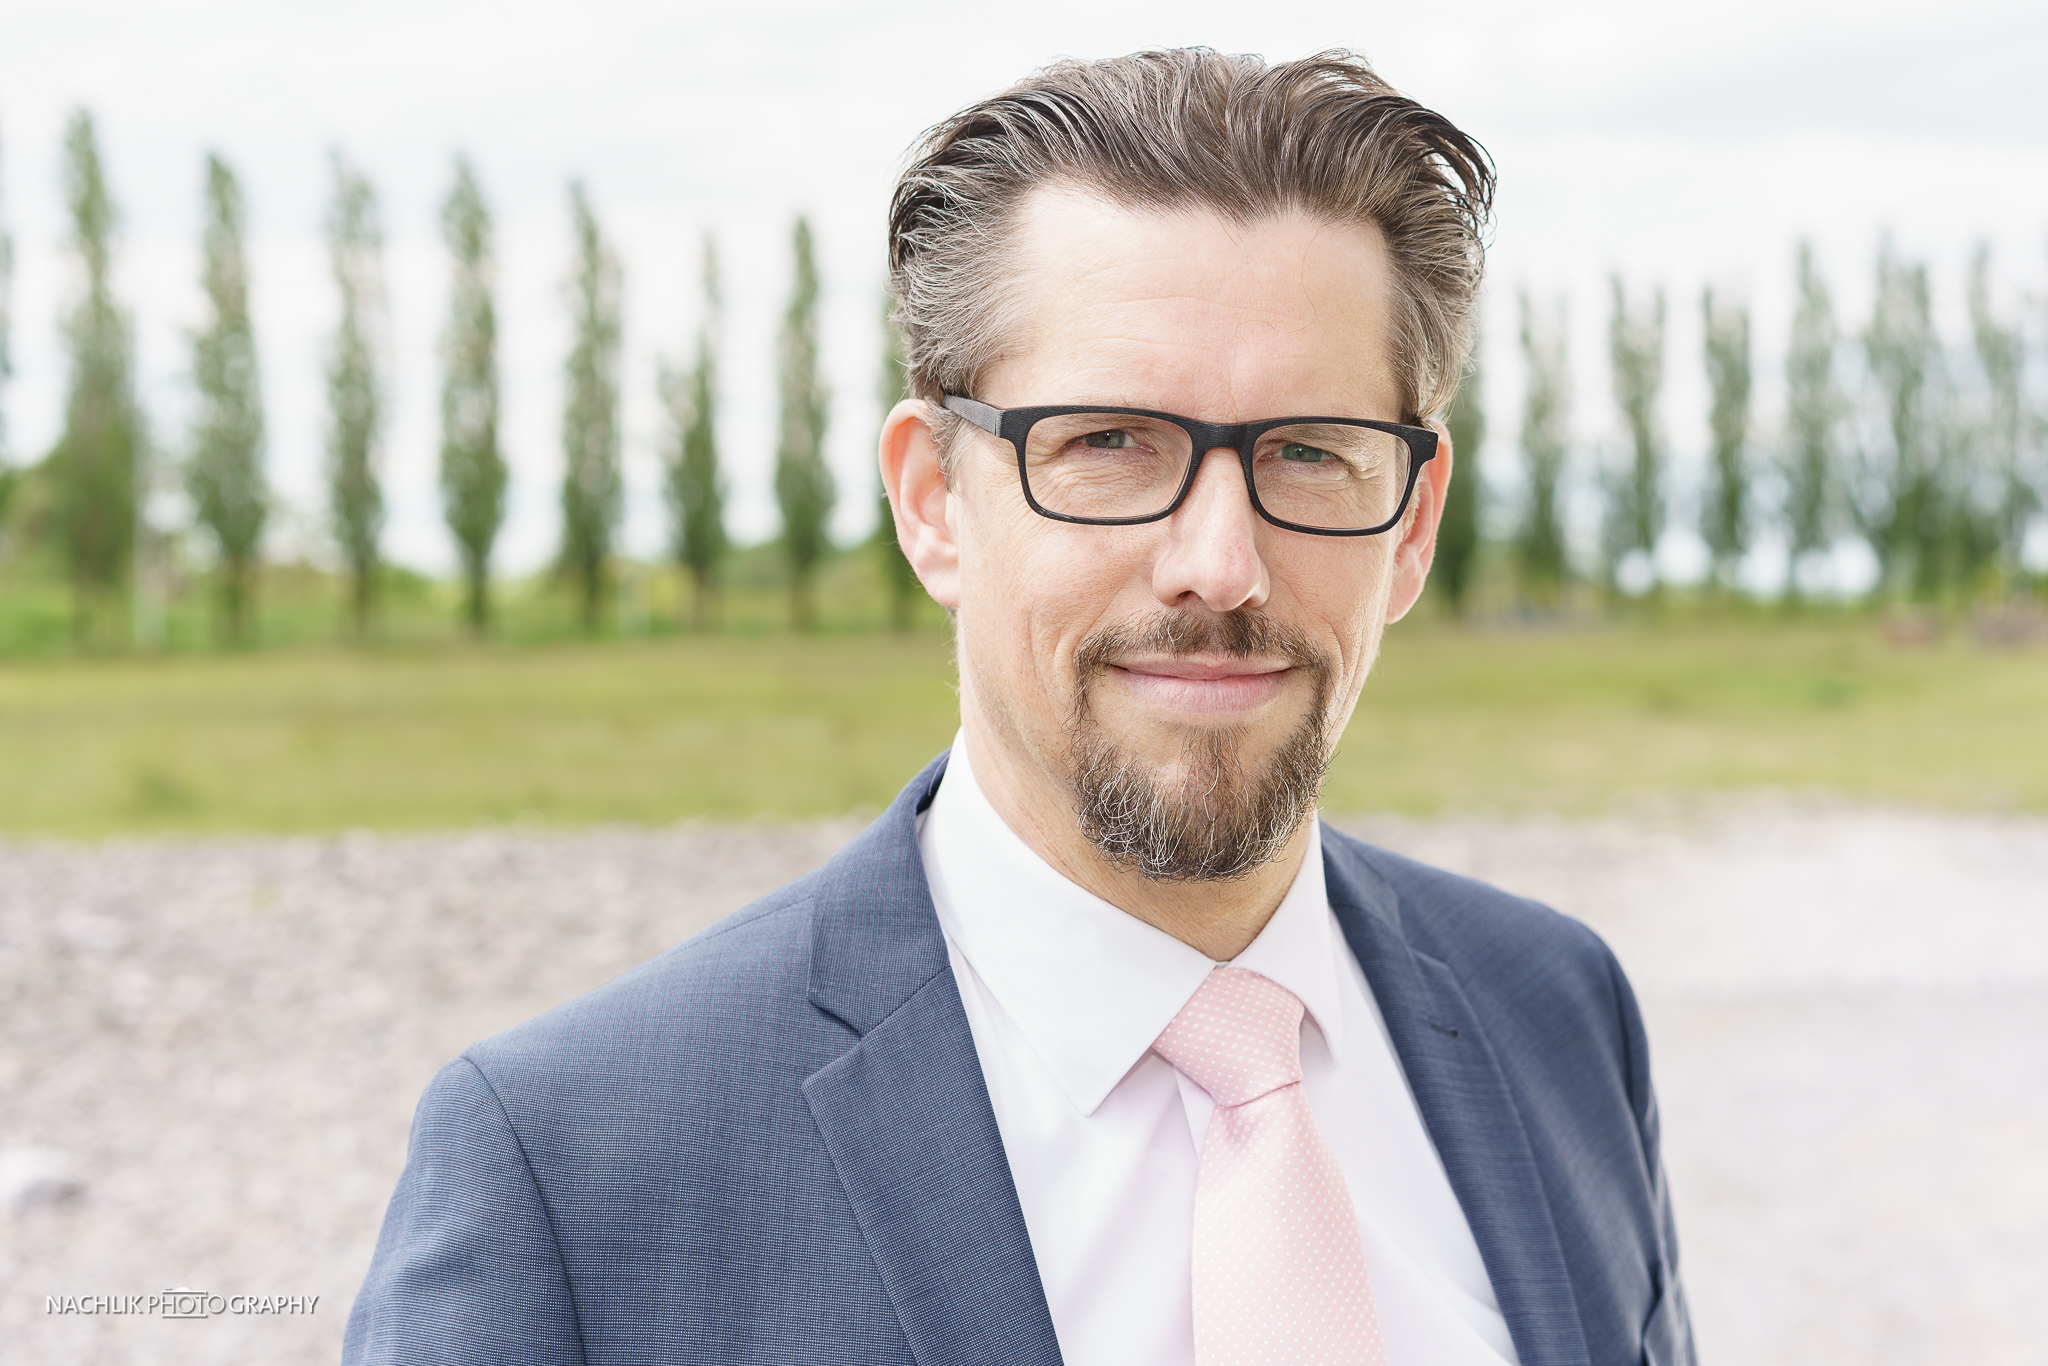 Expert Marketplace - Präventologe & Schlafcoach Markus Kamps  - Impressionen eins